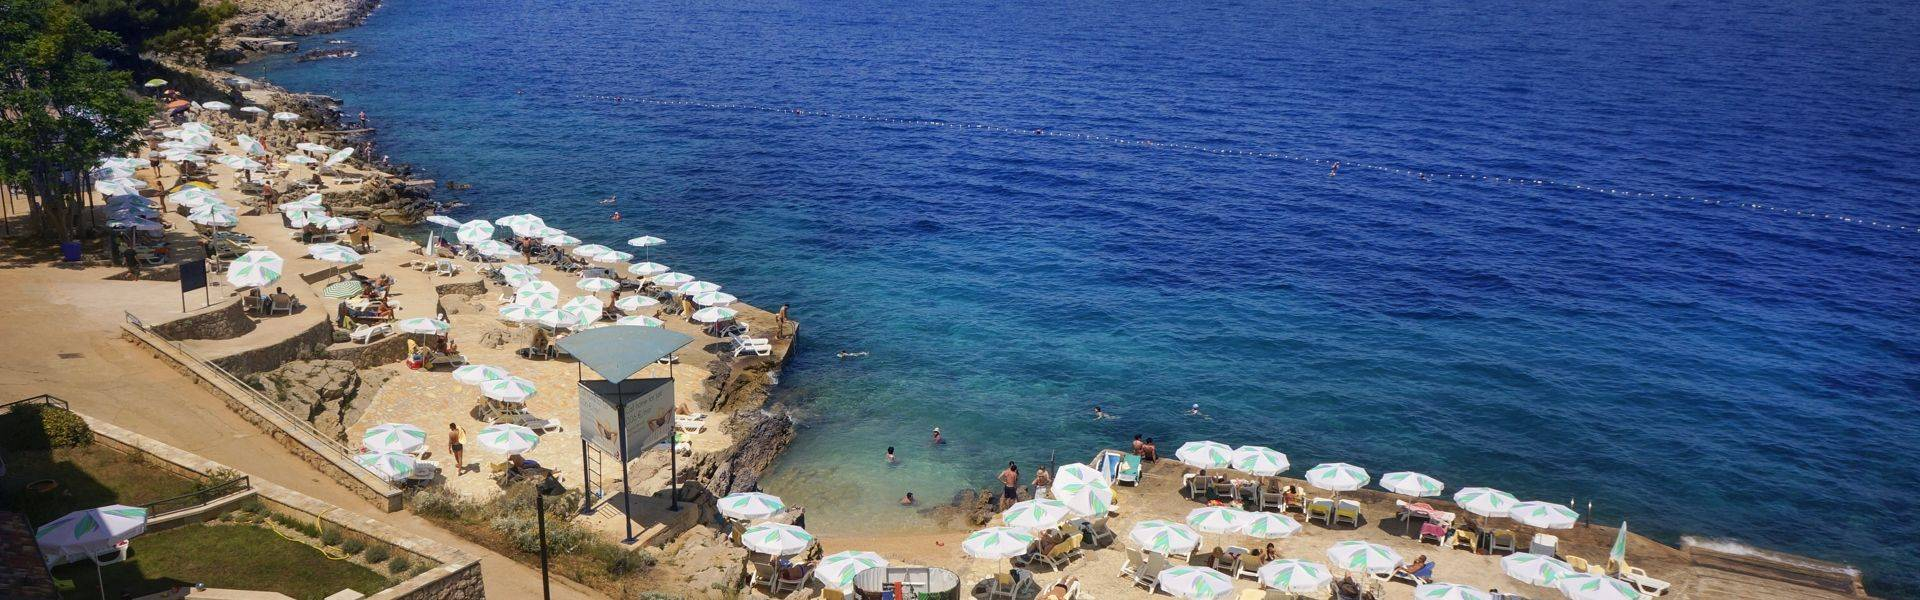 Vitality-Punta-beach-area.jpg